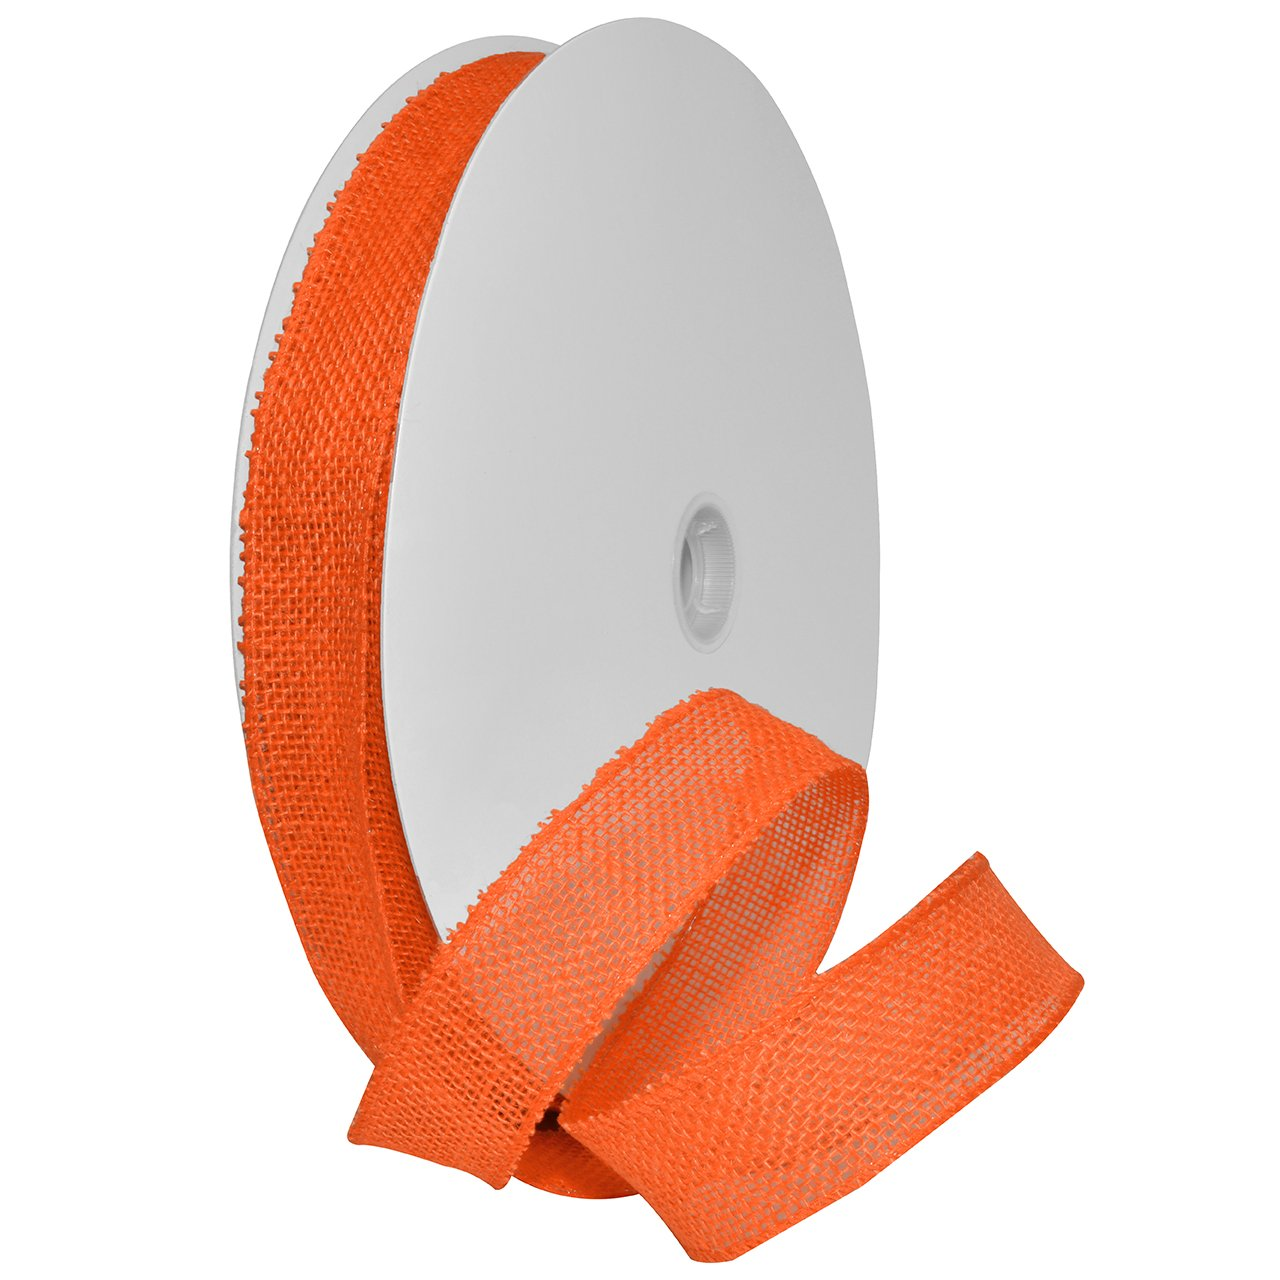 Ivory//Gold Morex Ribbon Swirl Wired Sheer Glitter Ribbon 1-1//2 inch by 50 Yards